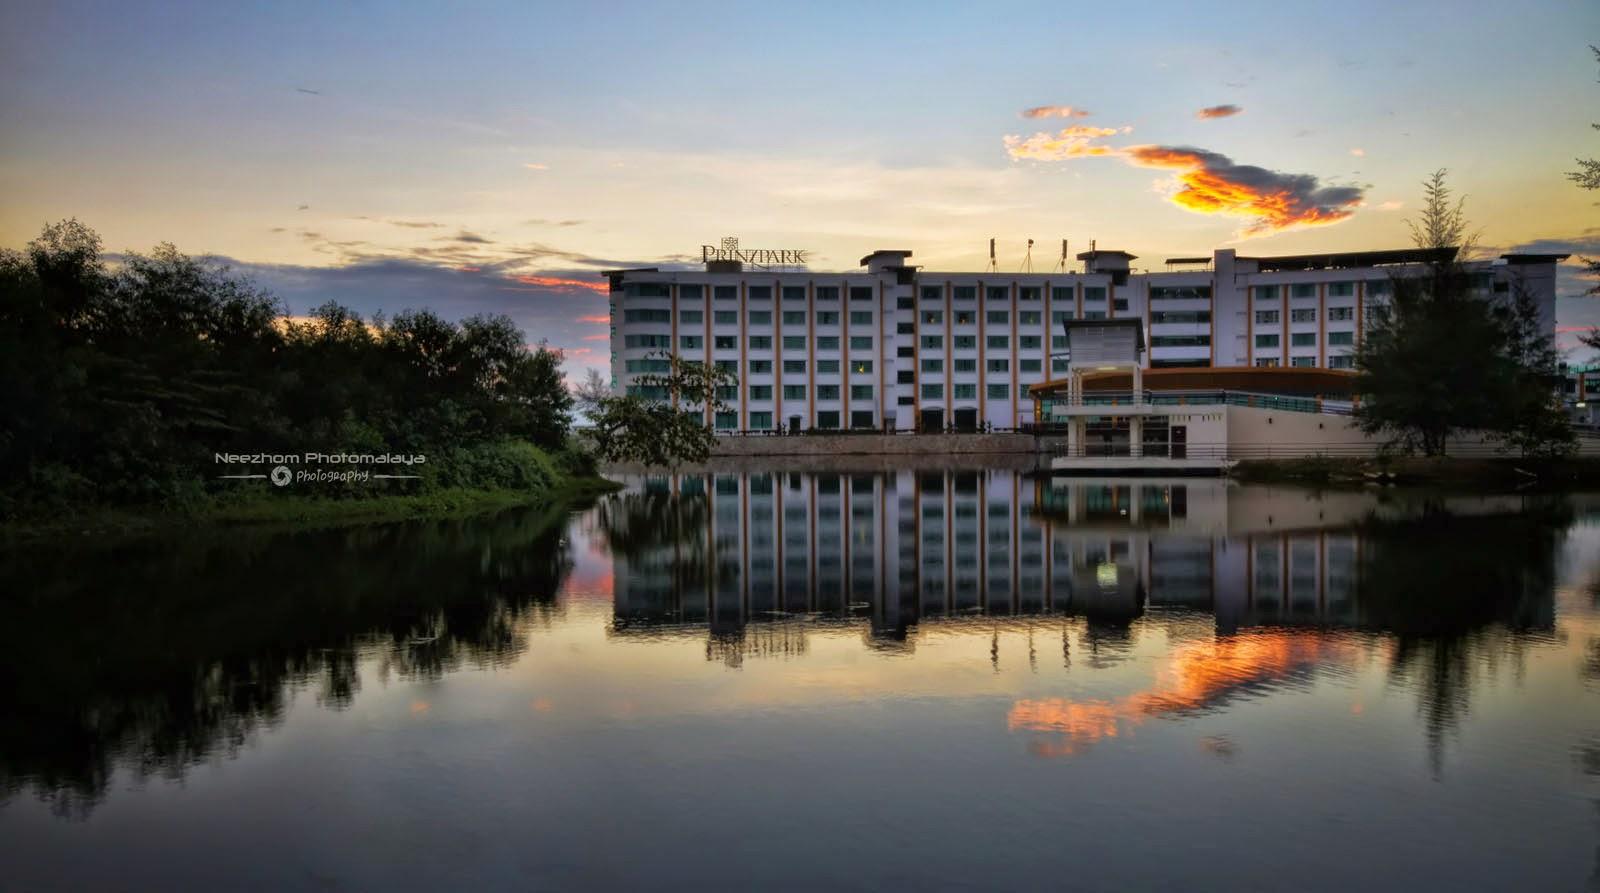 Prinzpark hotel dan Sunrise di Lagun Kuala Ibai